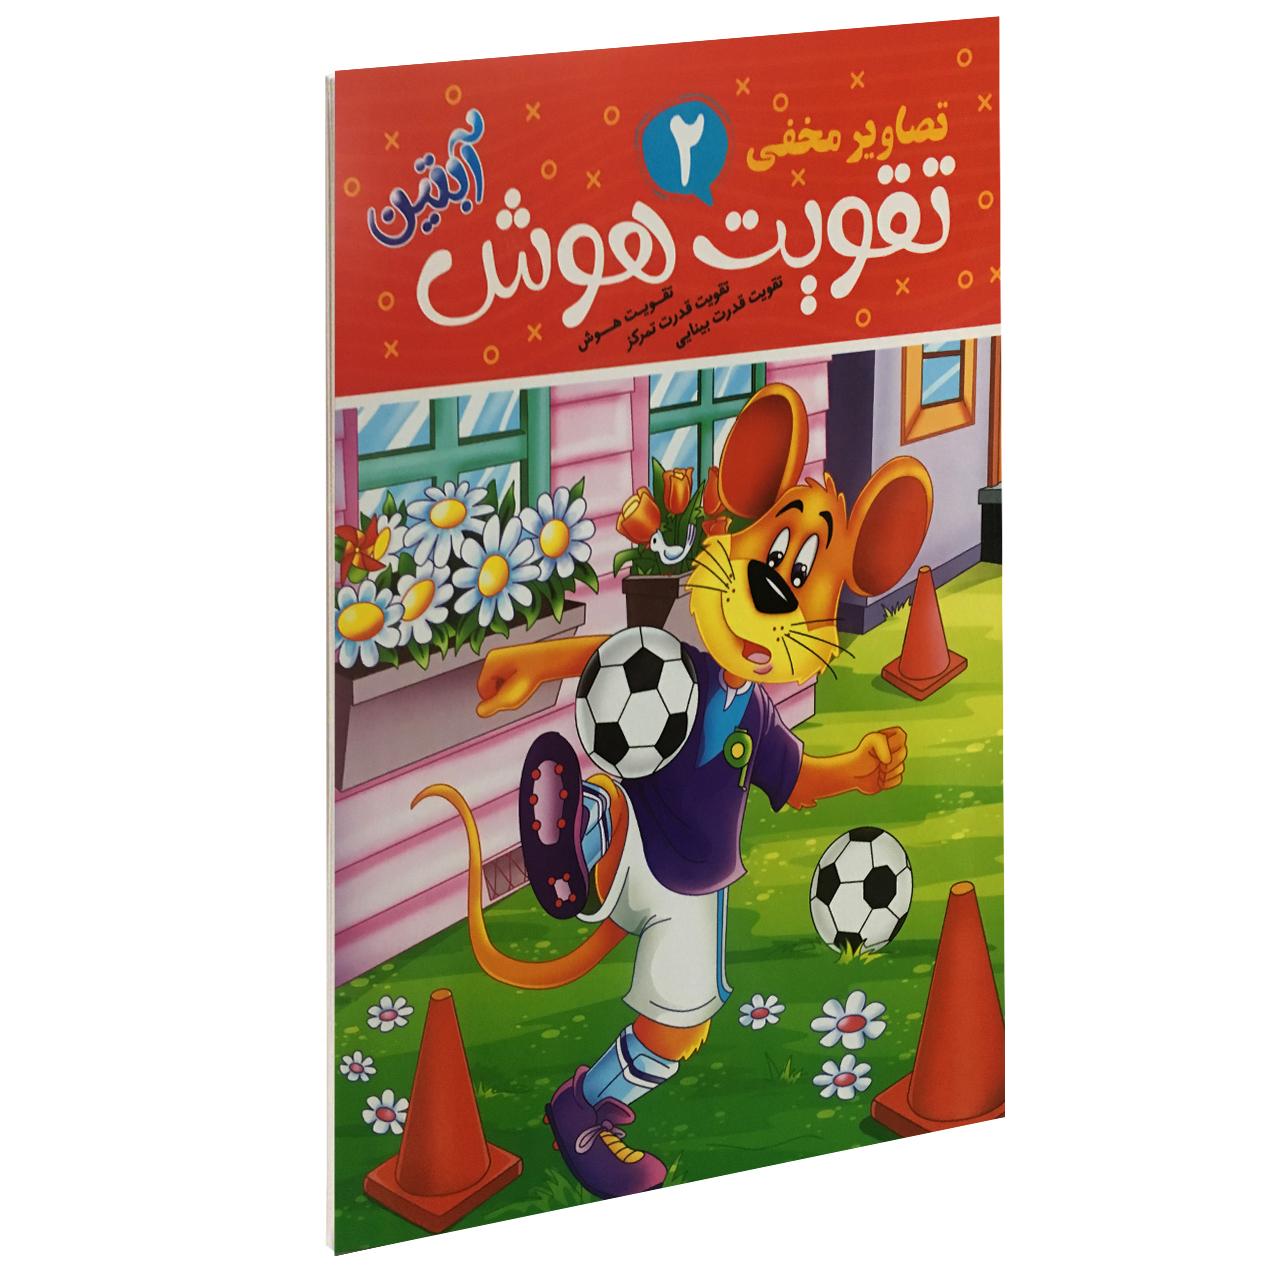 خرید                      کتاب تقویت هوش آبتین 2 اثر محمد جواد گلشنی نشر یوشیتا